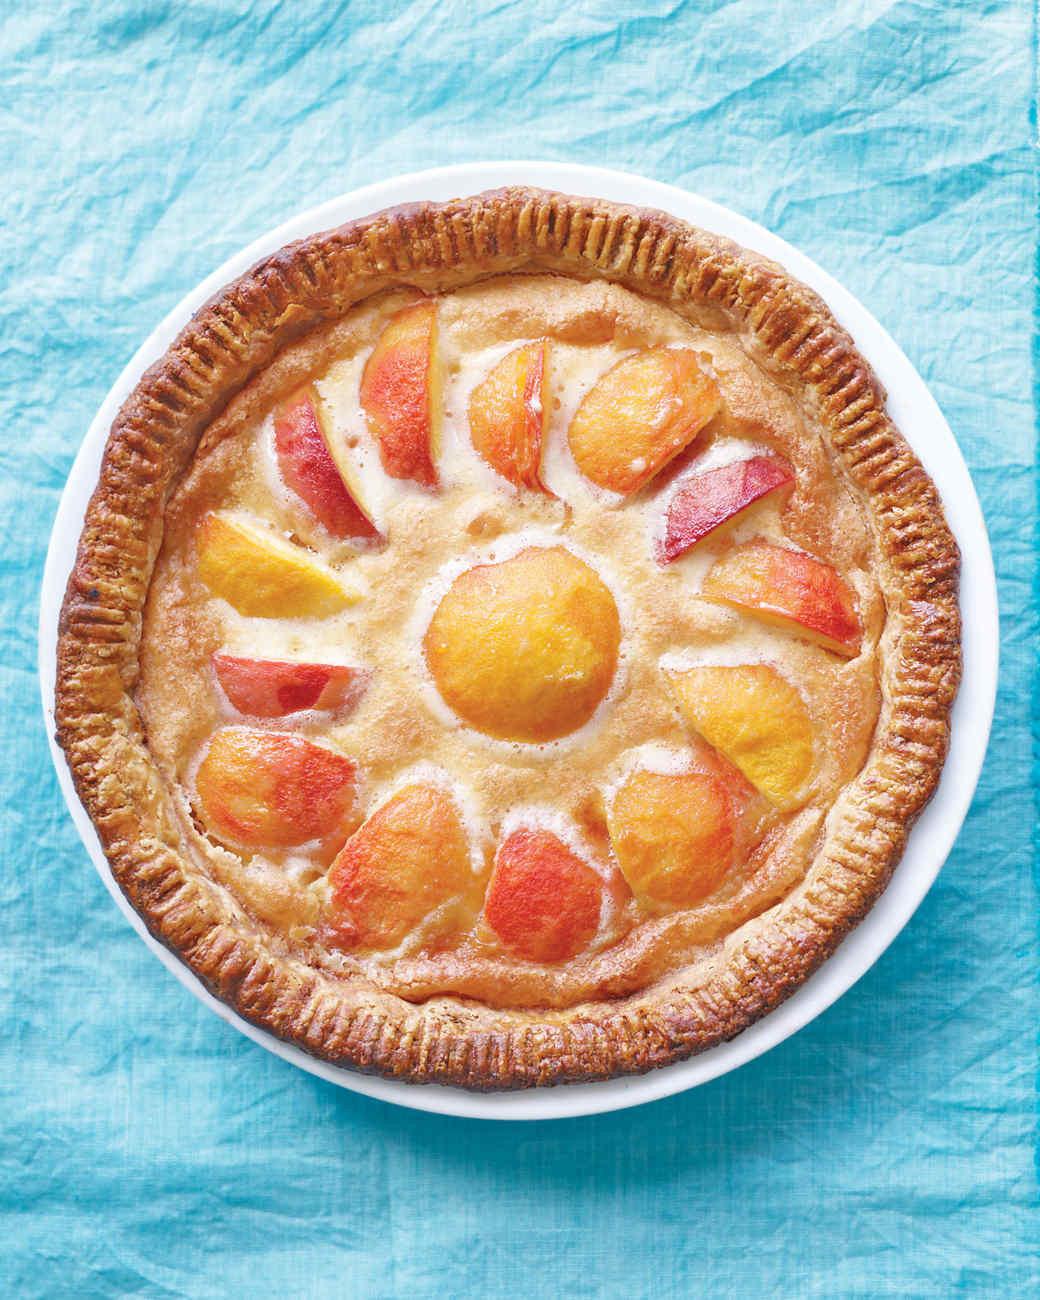 Summertime Pie Recipes  Summer Fruit Pie and Tart Recipes